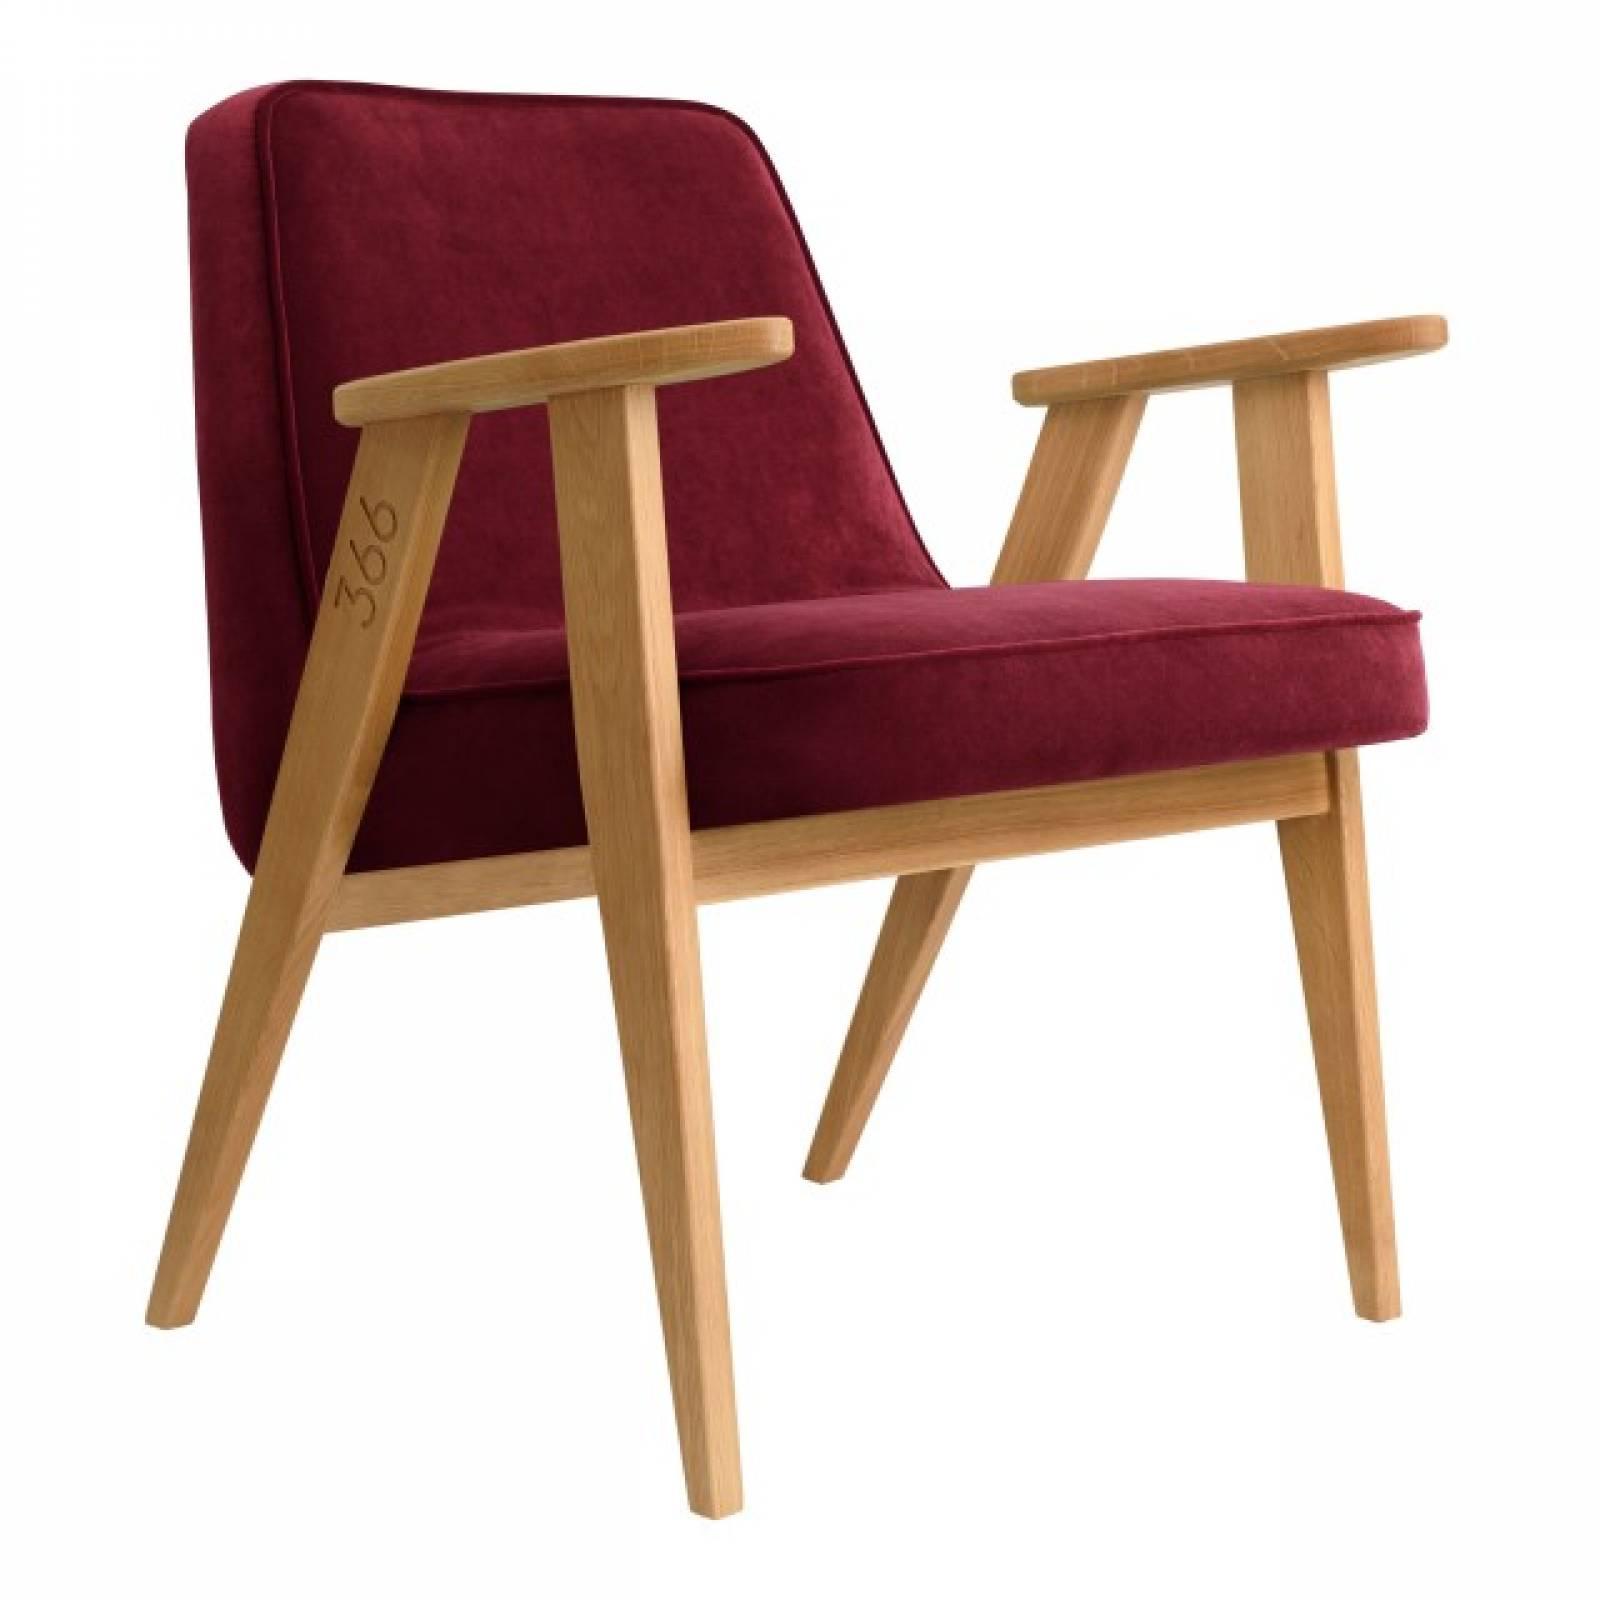 366 Plus Armchair - Velvet Fabrics thumbnails